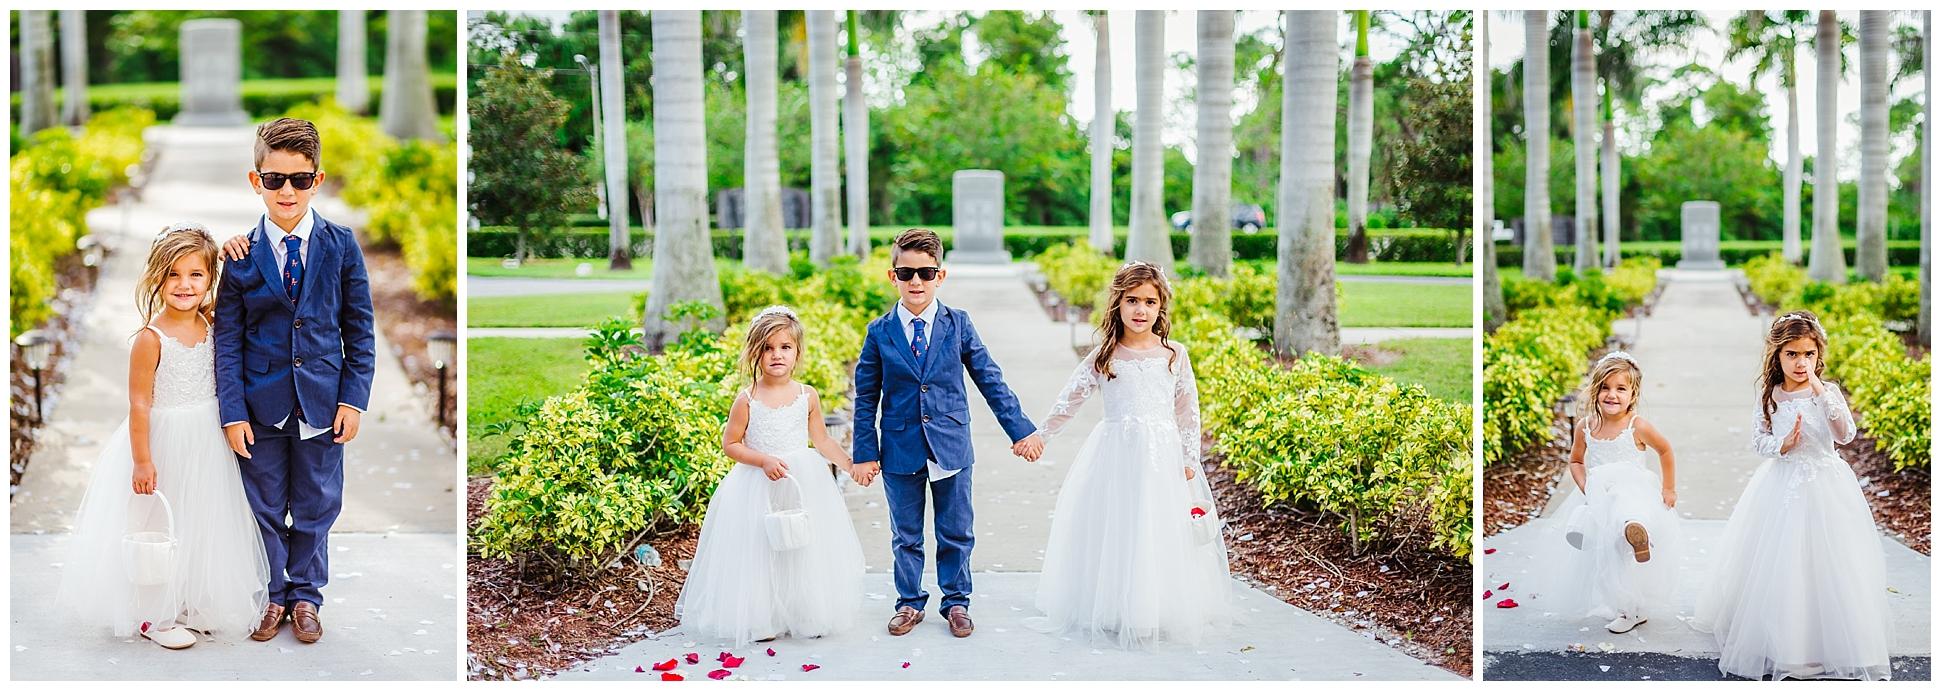 indian-armenian-clearwater-wedding-chic-luxury-photogaphy_0070.jpg